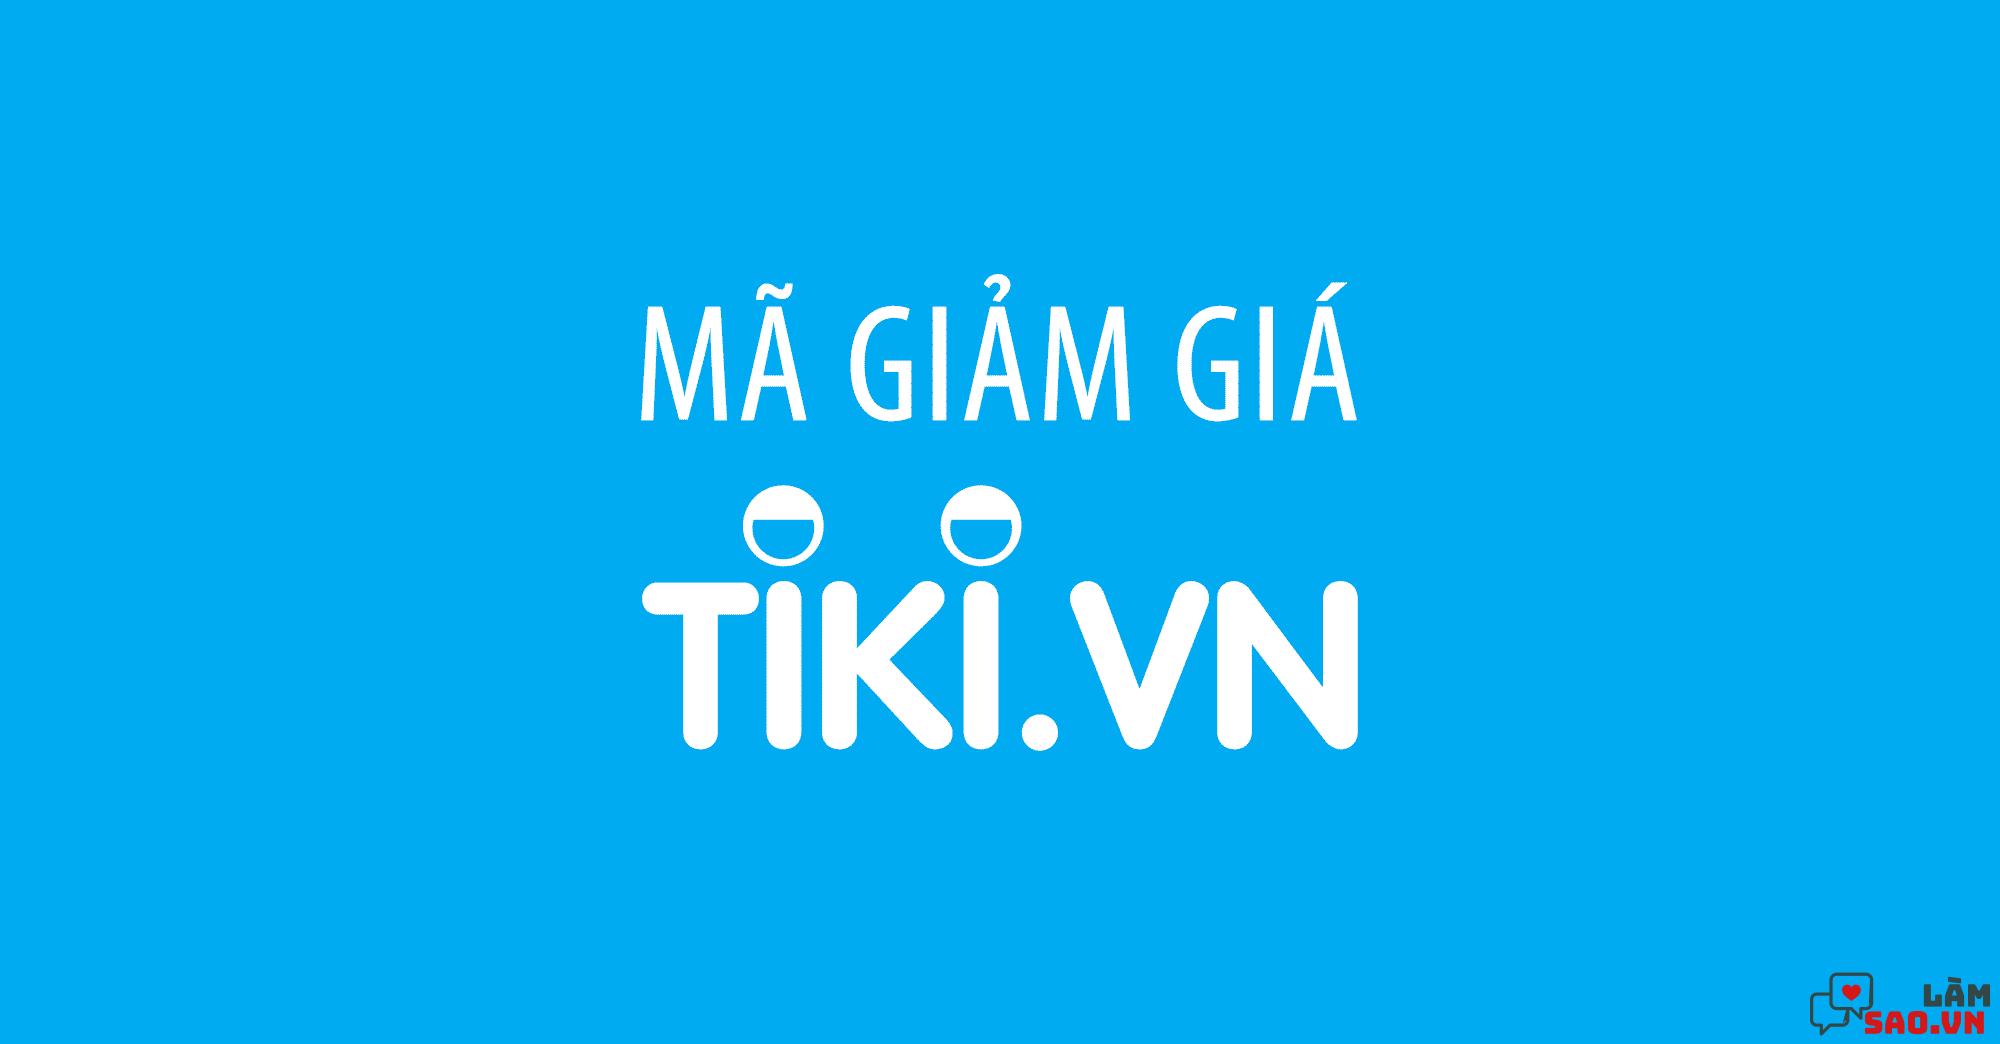 Mã giảm giá Tiki